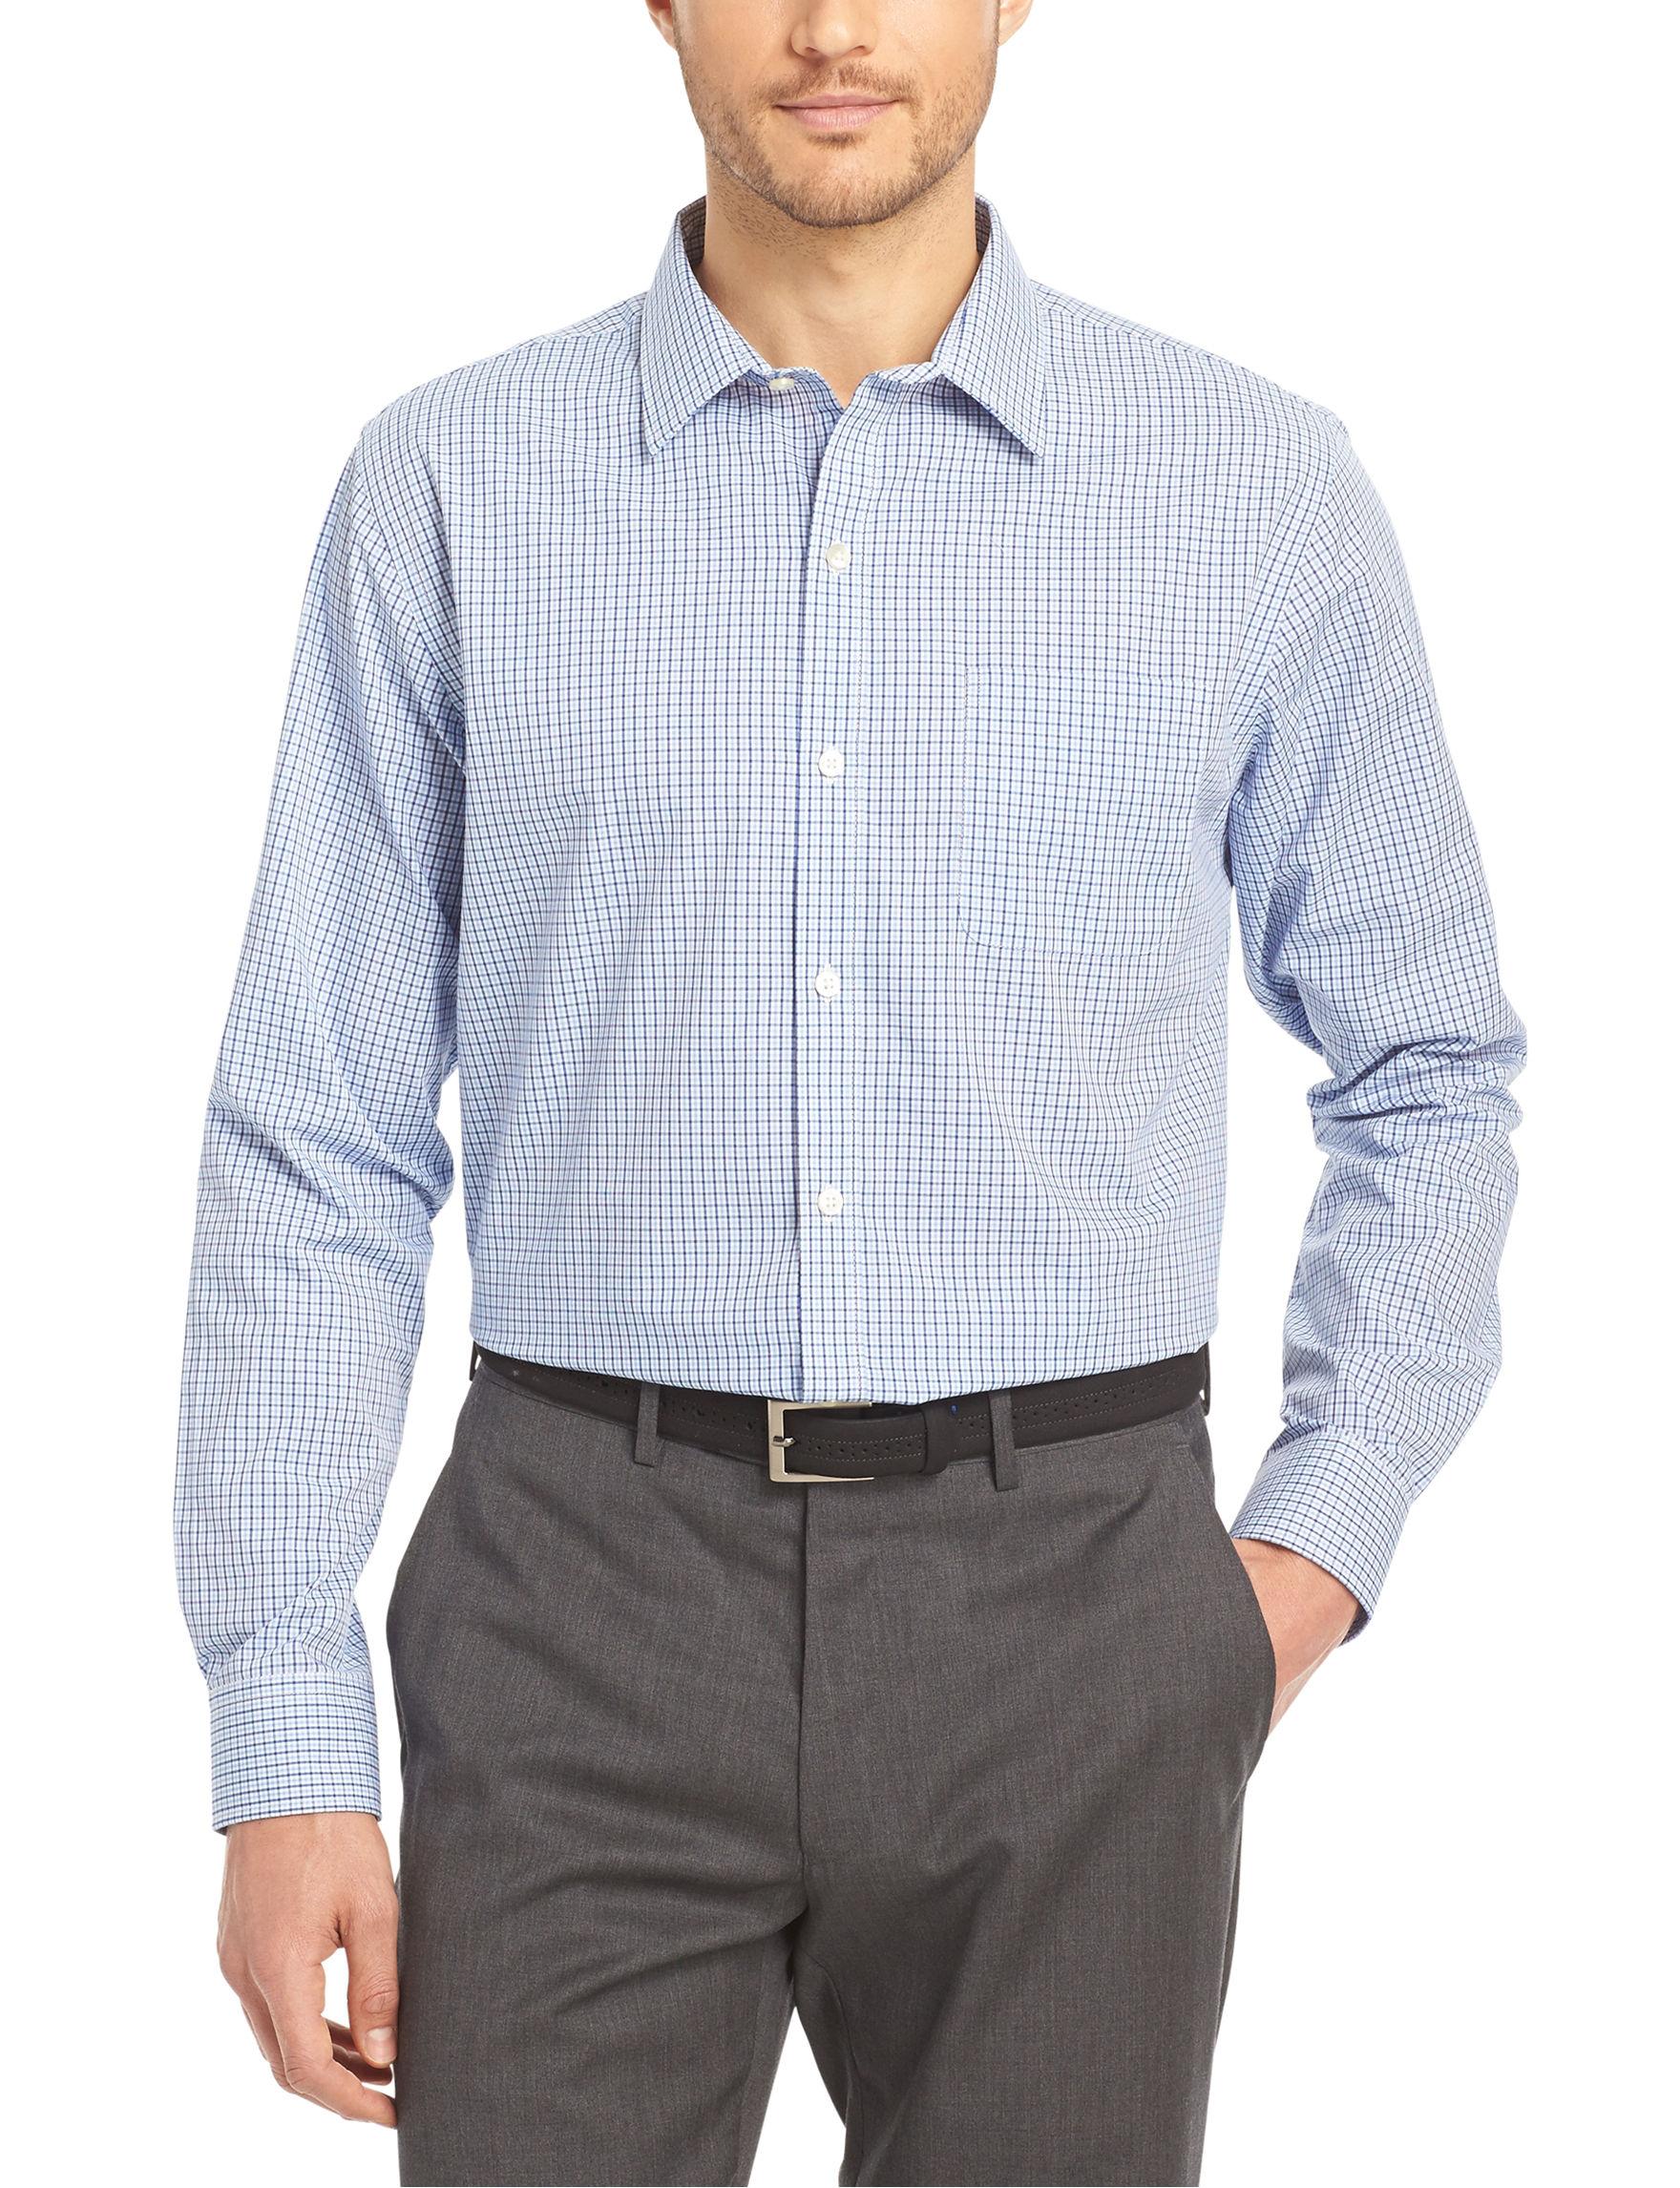 Van heusen mini check no iron stretch woven shirt stage for Van heusen iron free shirts